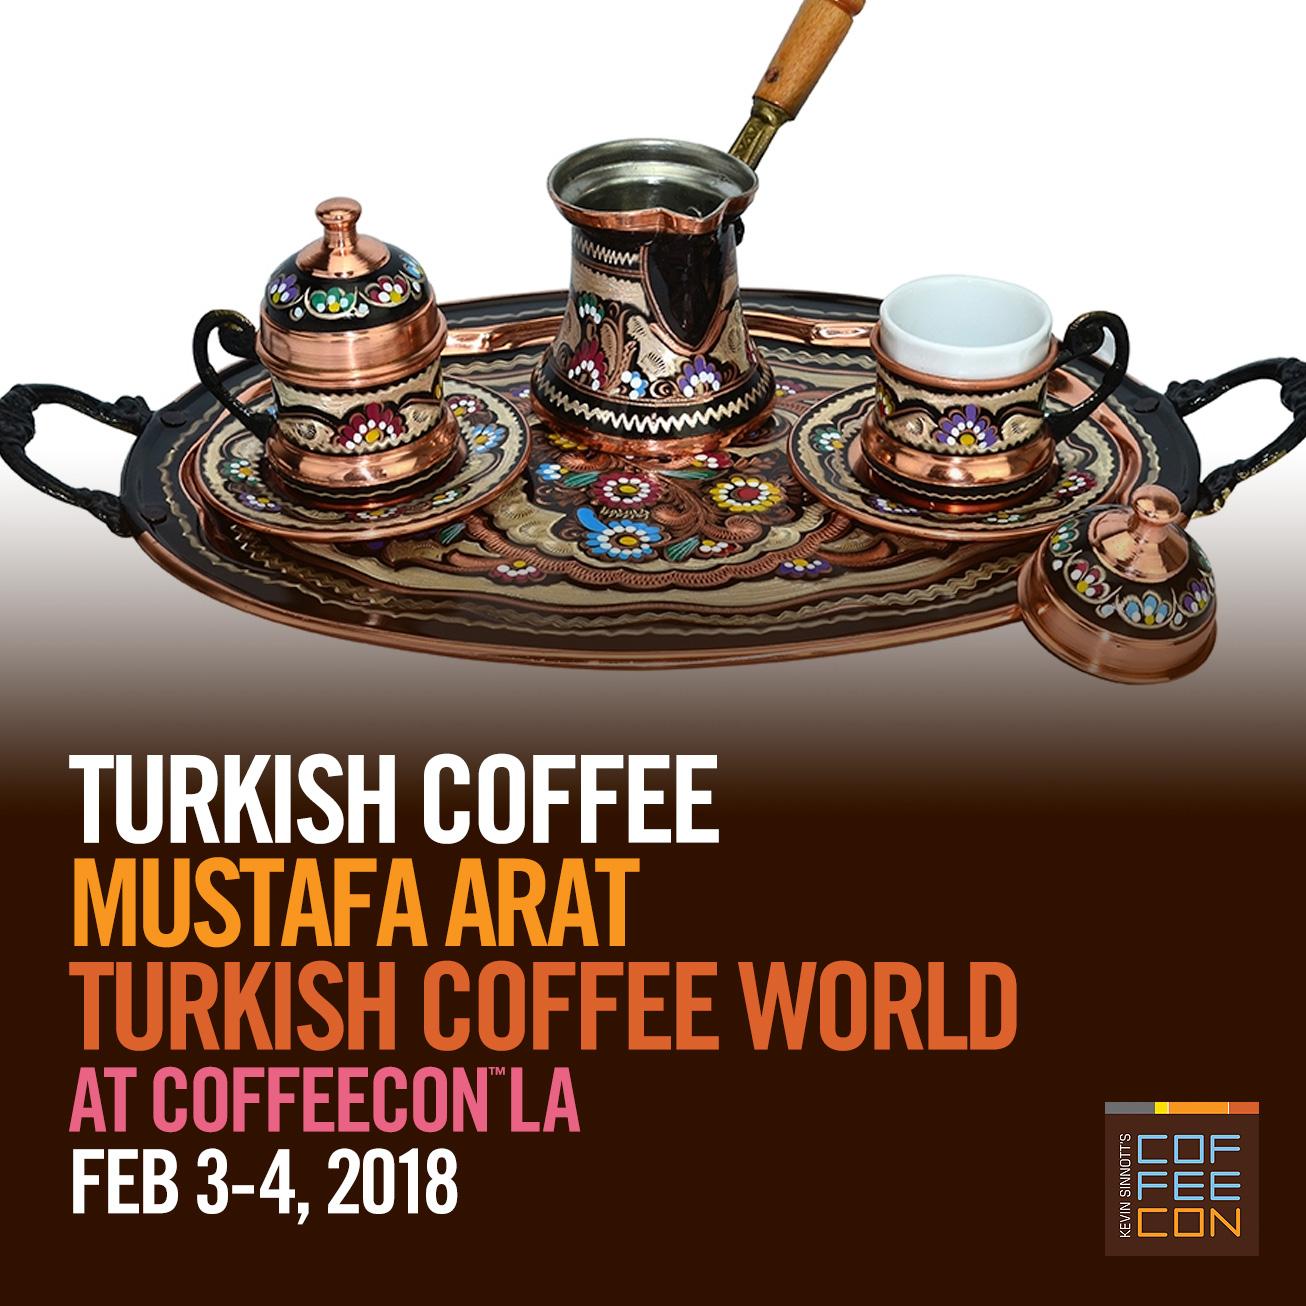 Turkish Coffee at CoffeeConLA 2018 with Mustafa Arat